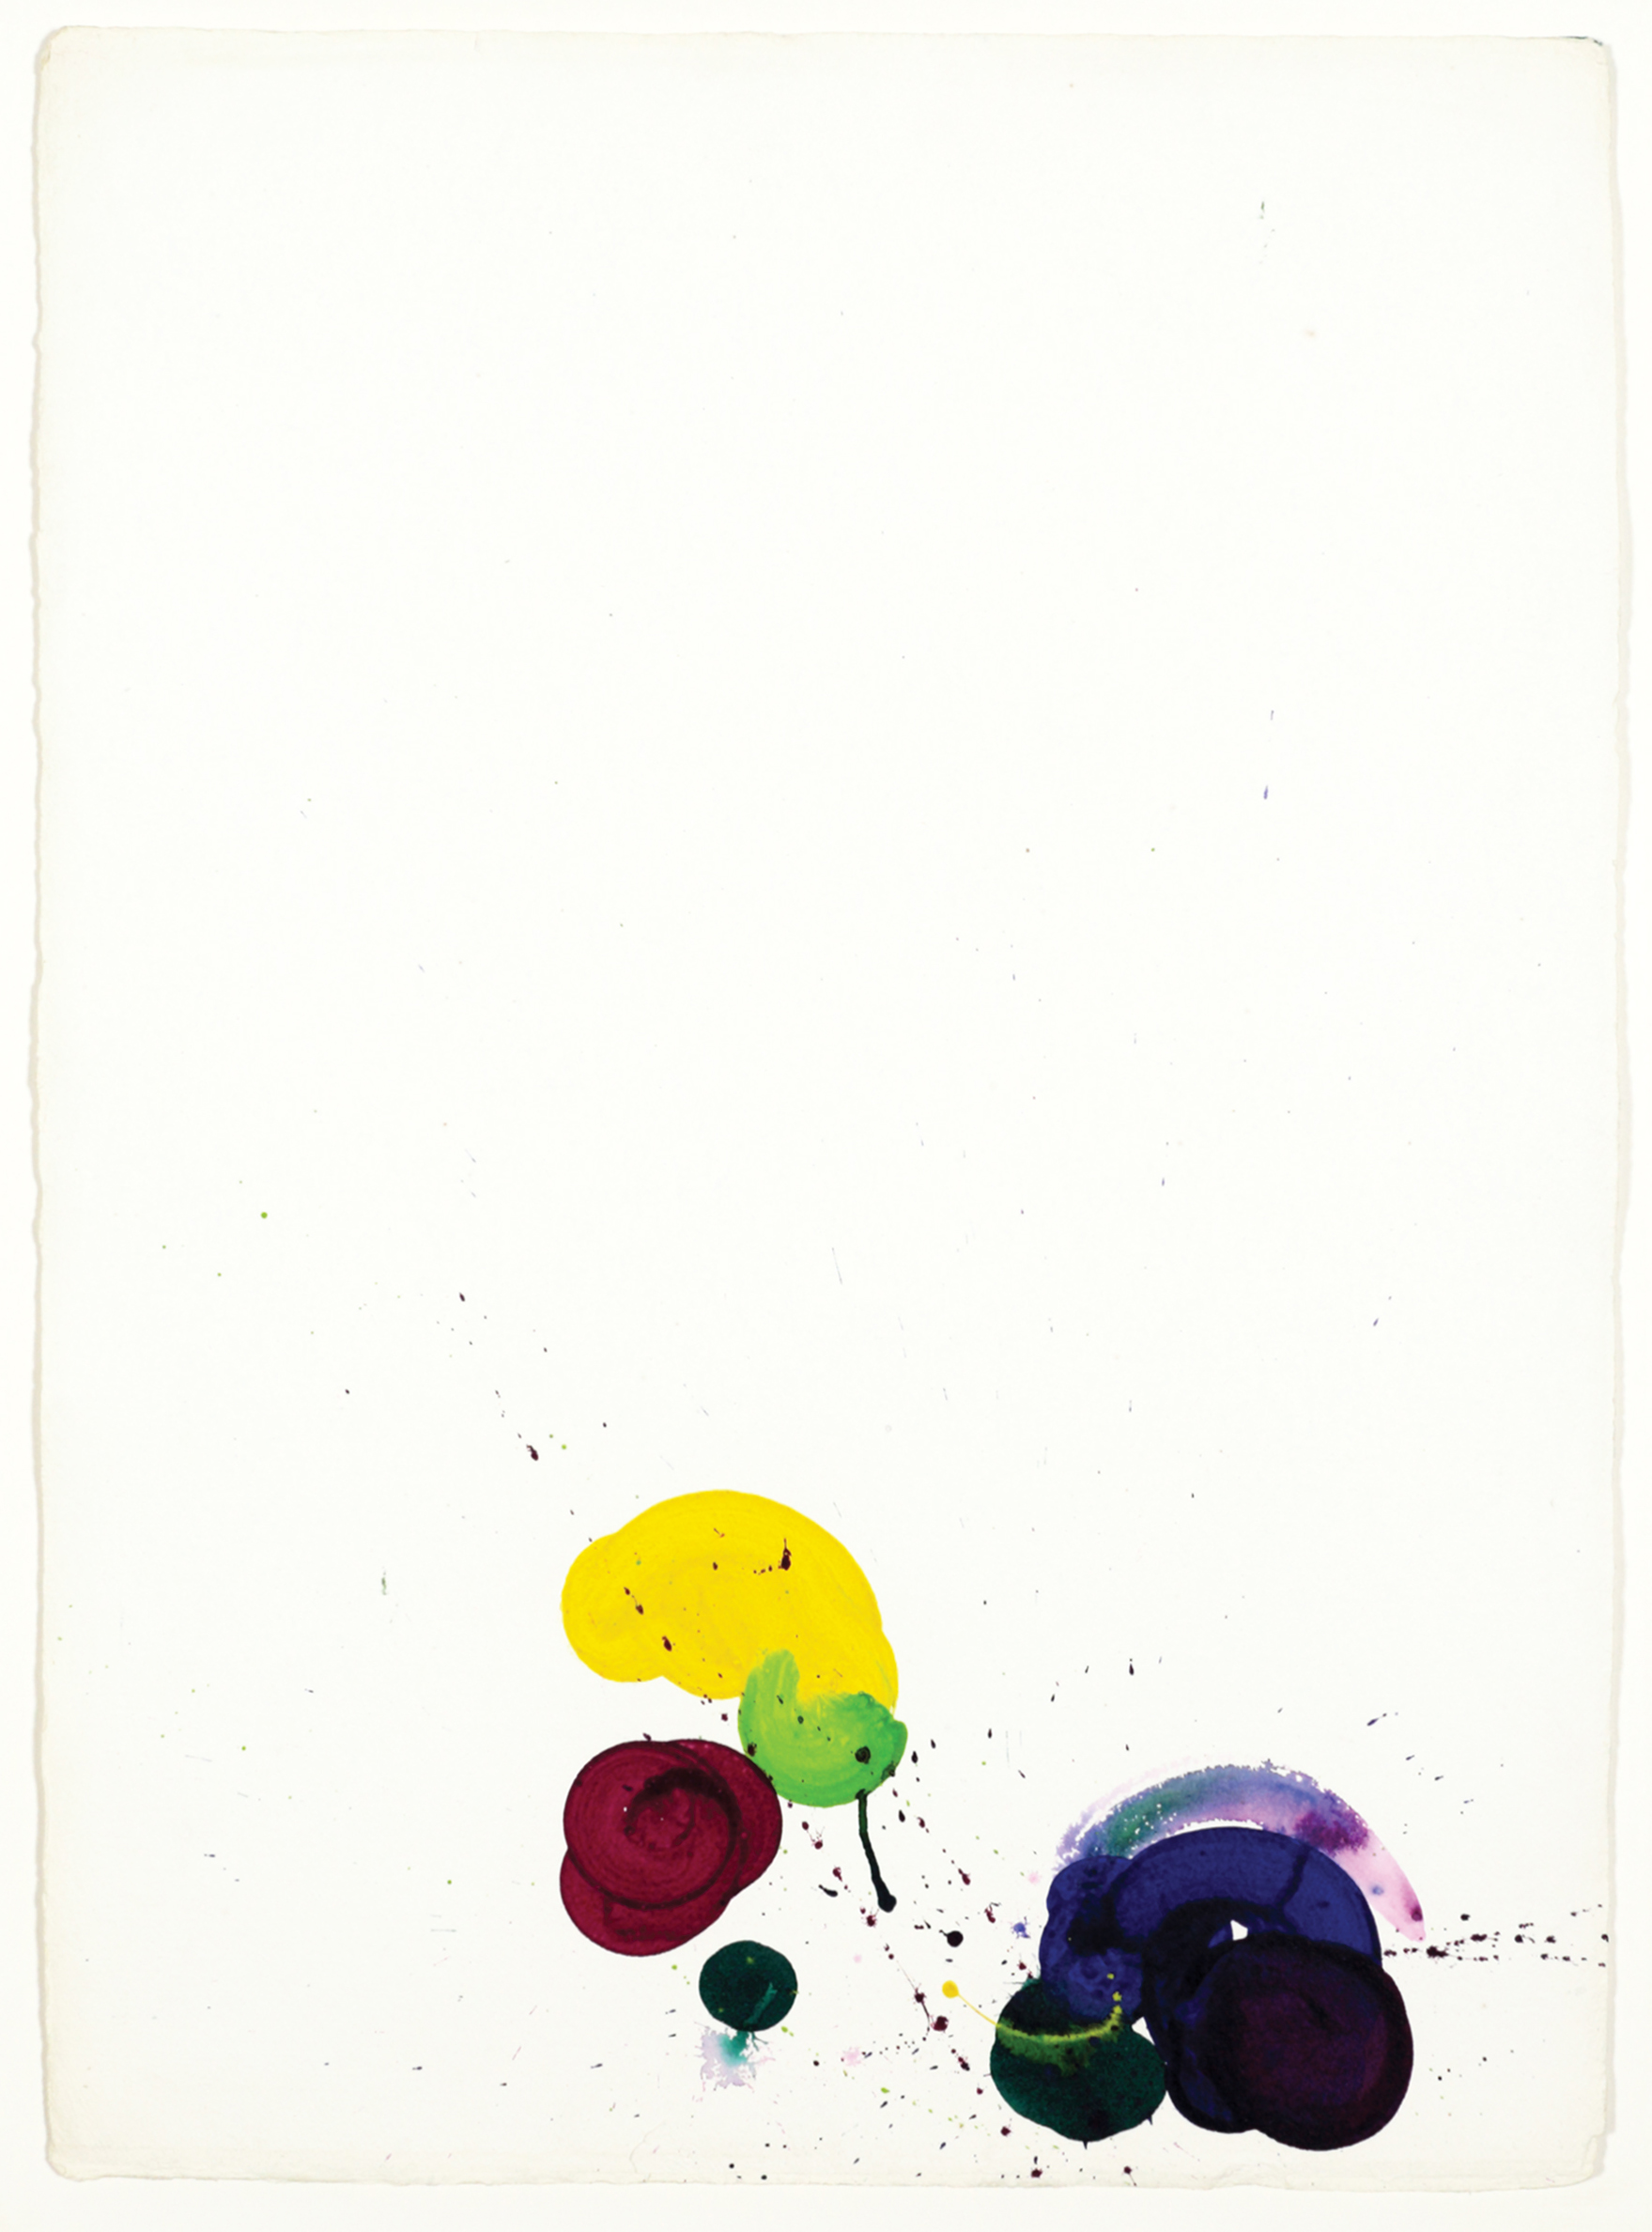 Untitled (SF62-055), 1963